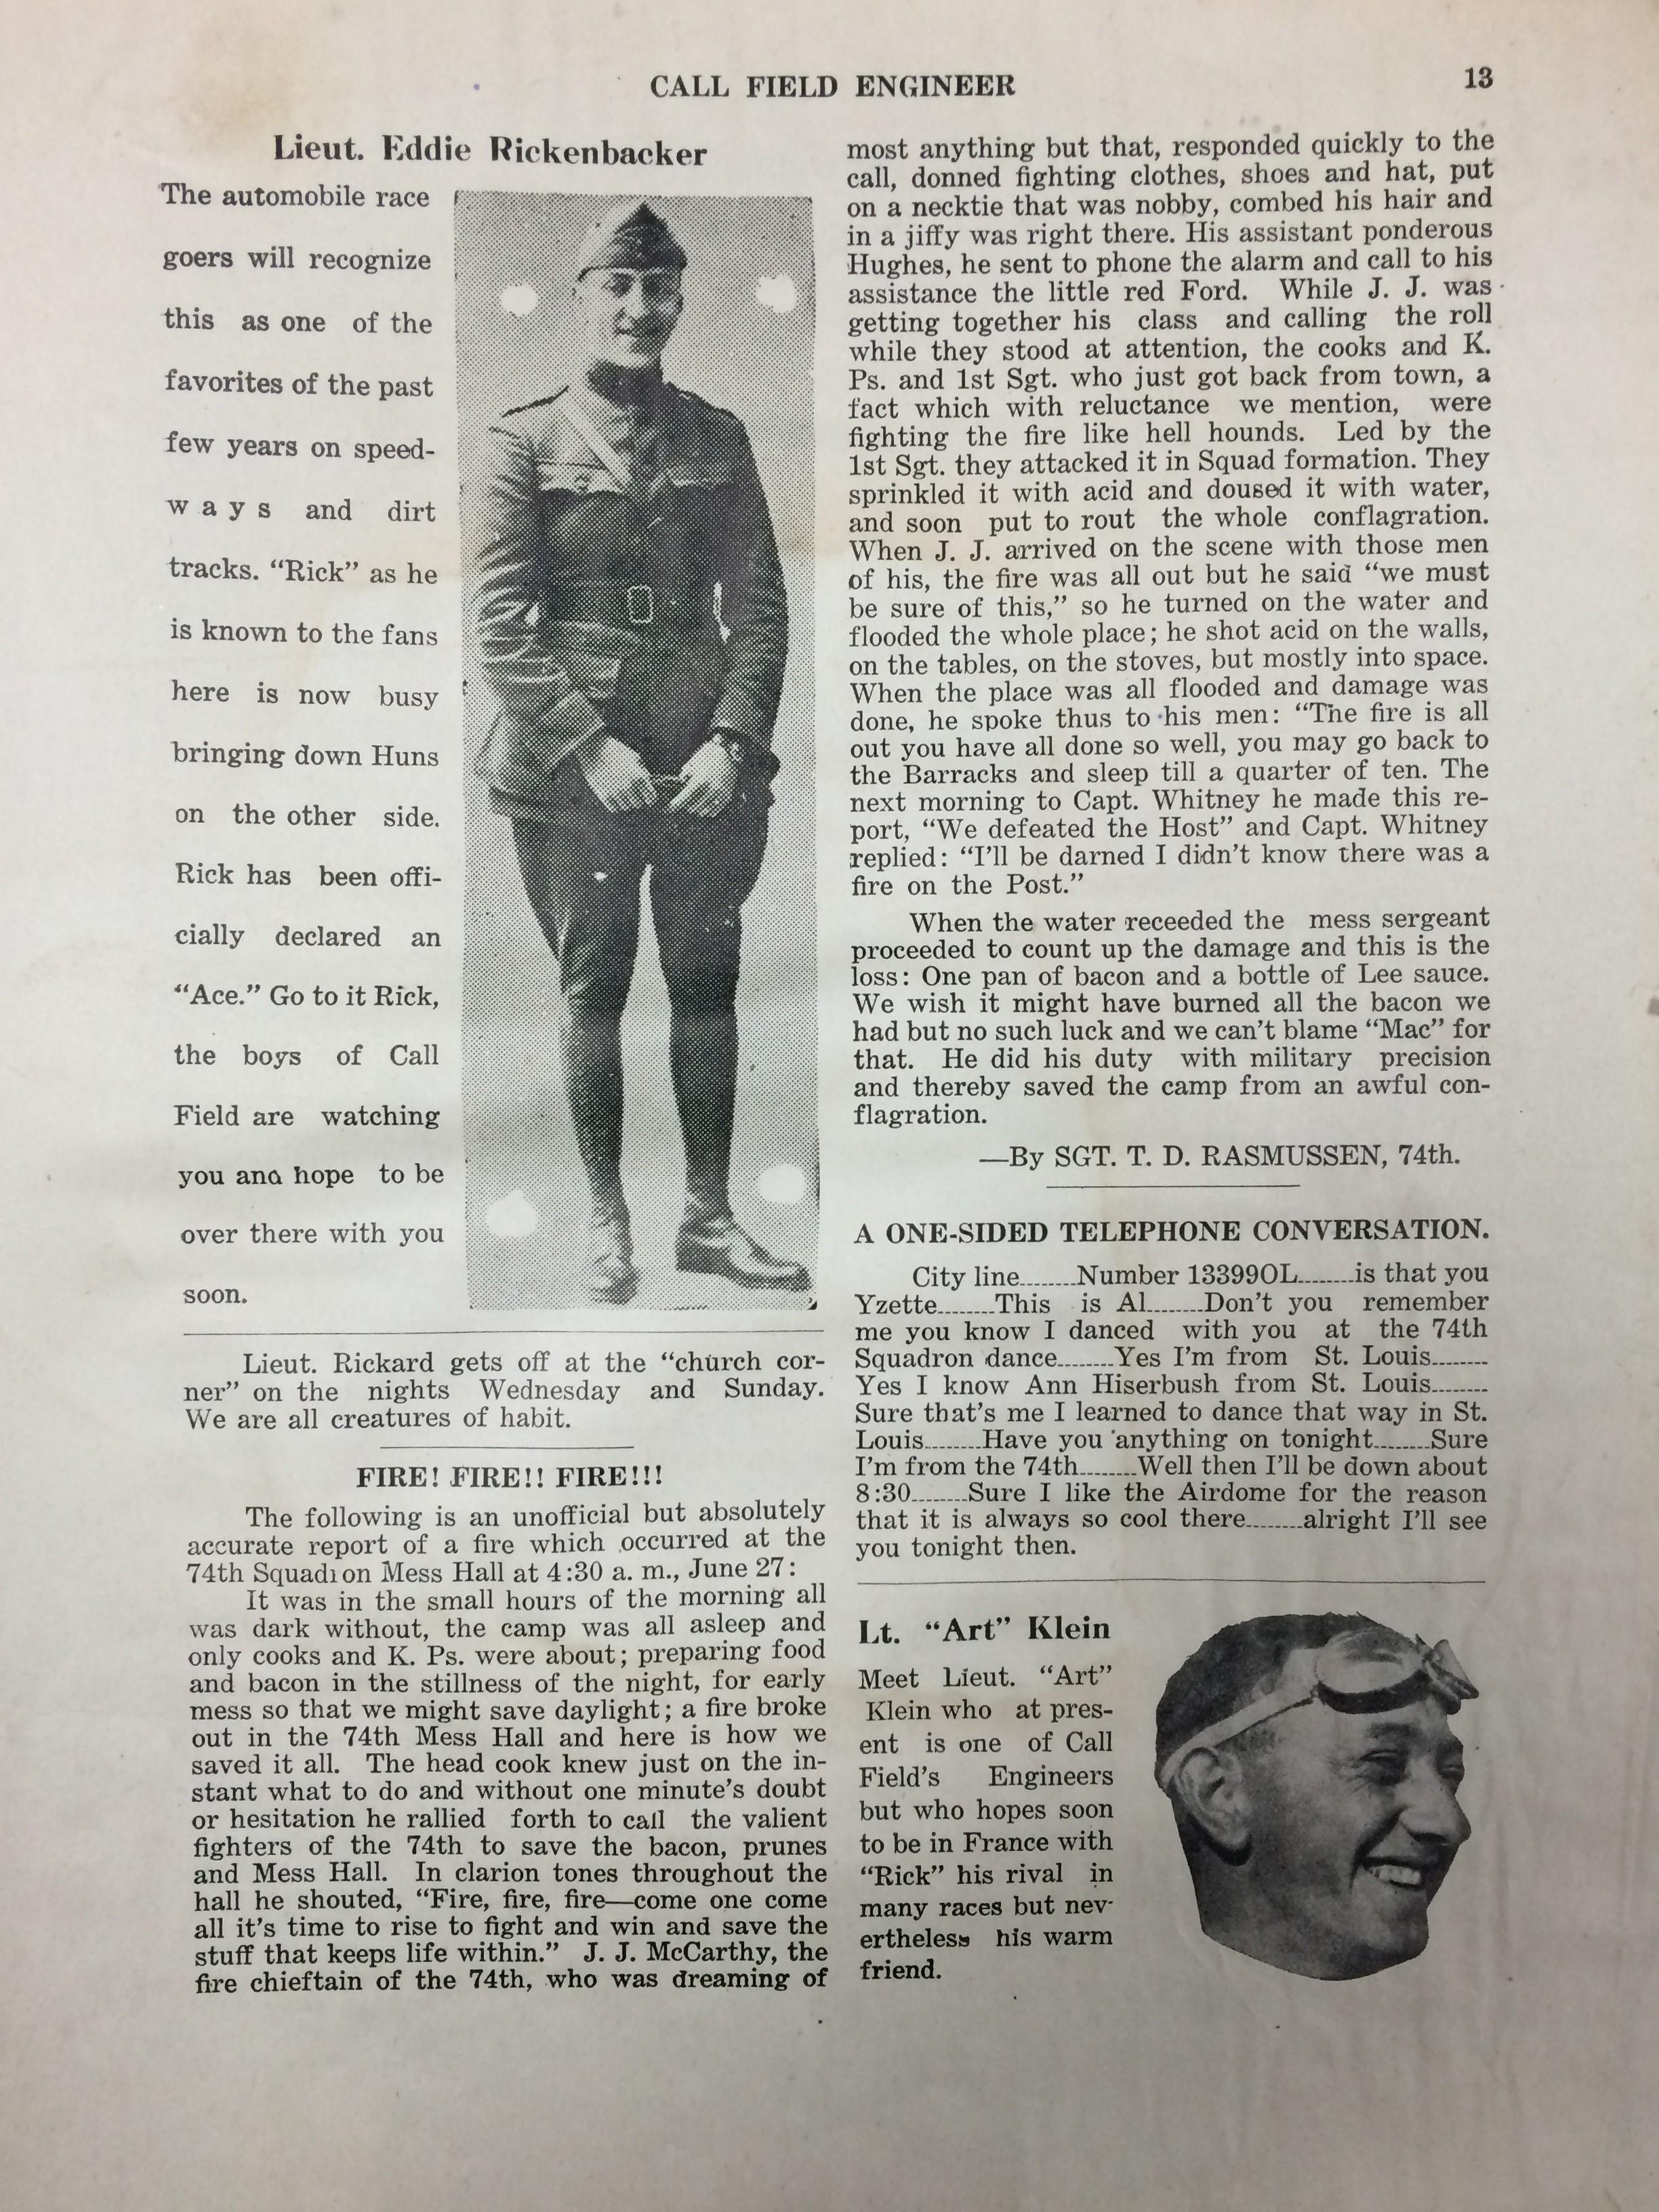 Image 15 July 1918 Engineer